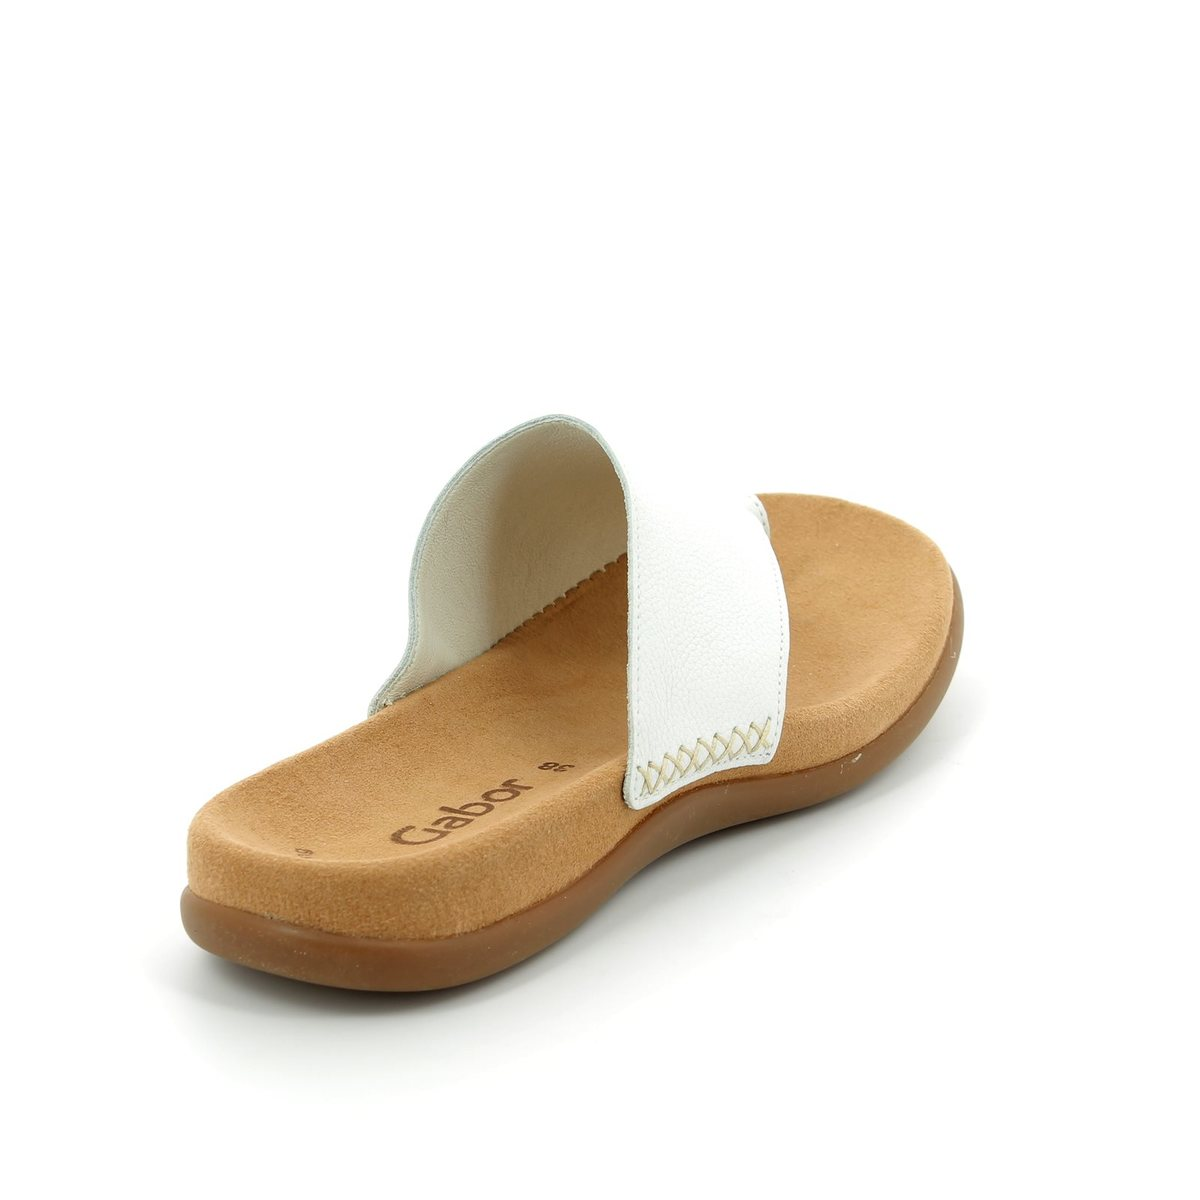 5b5a667ef1a048 Gabor Sandals - White - 03.700.21 LANZAROTE